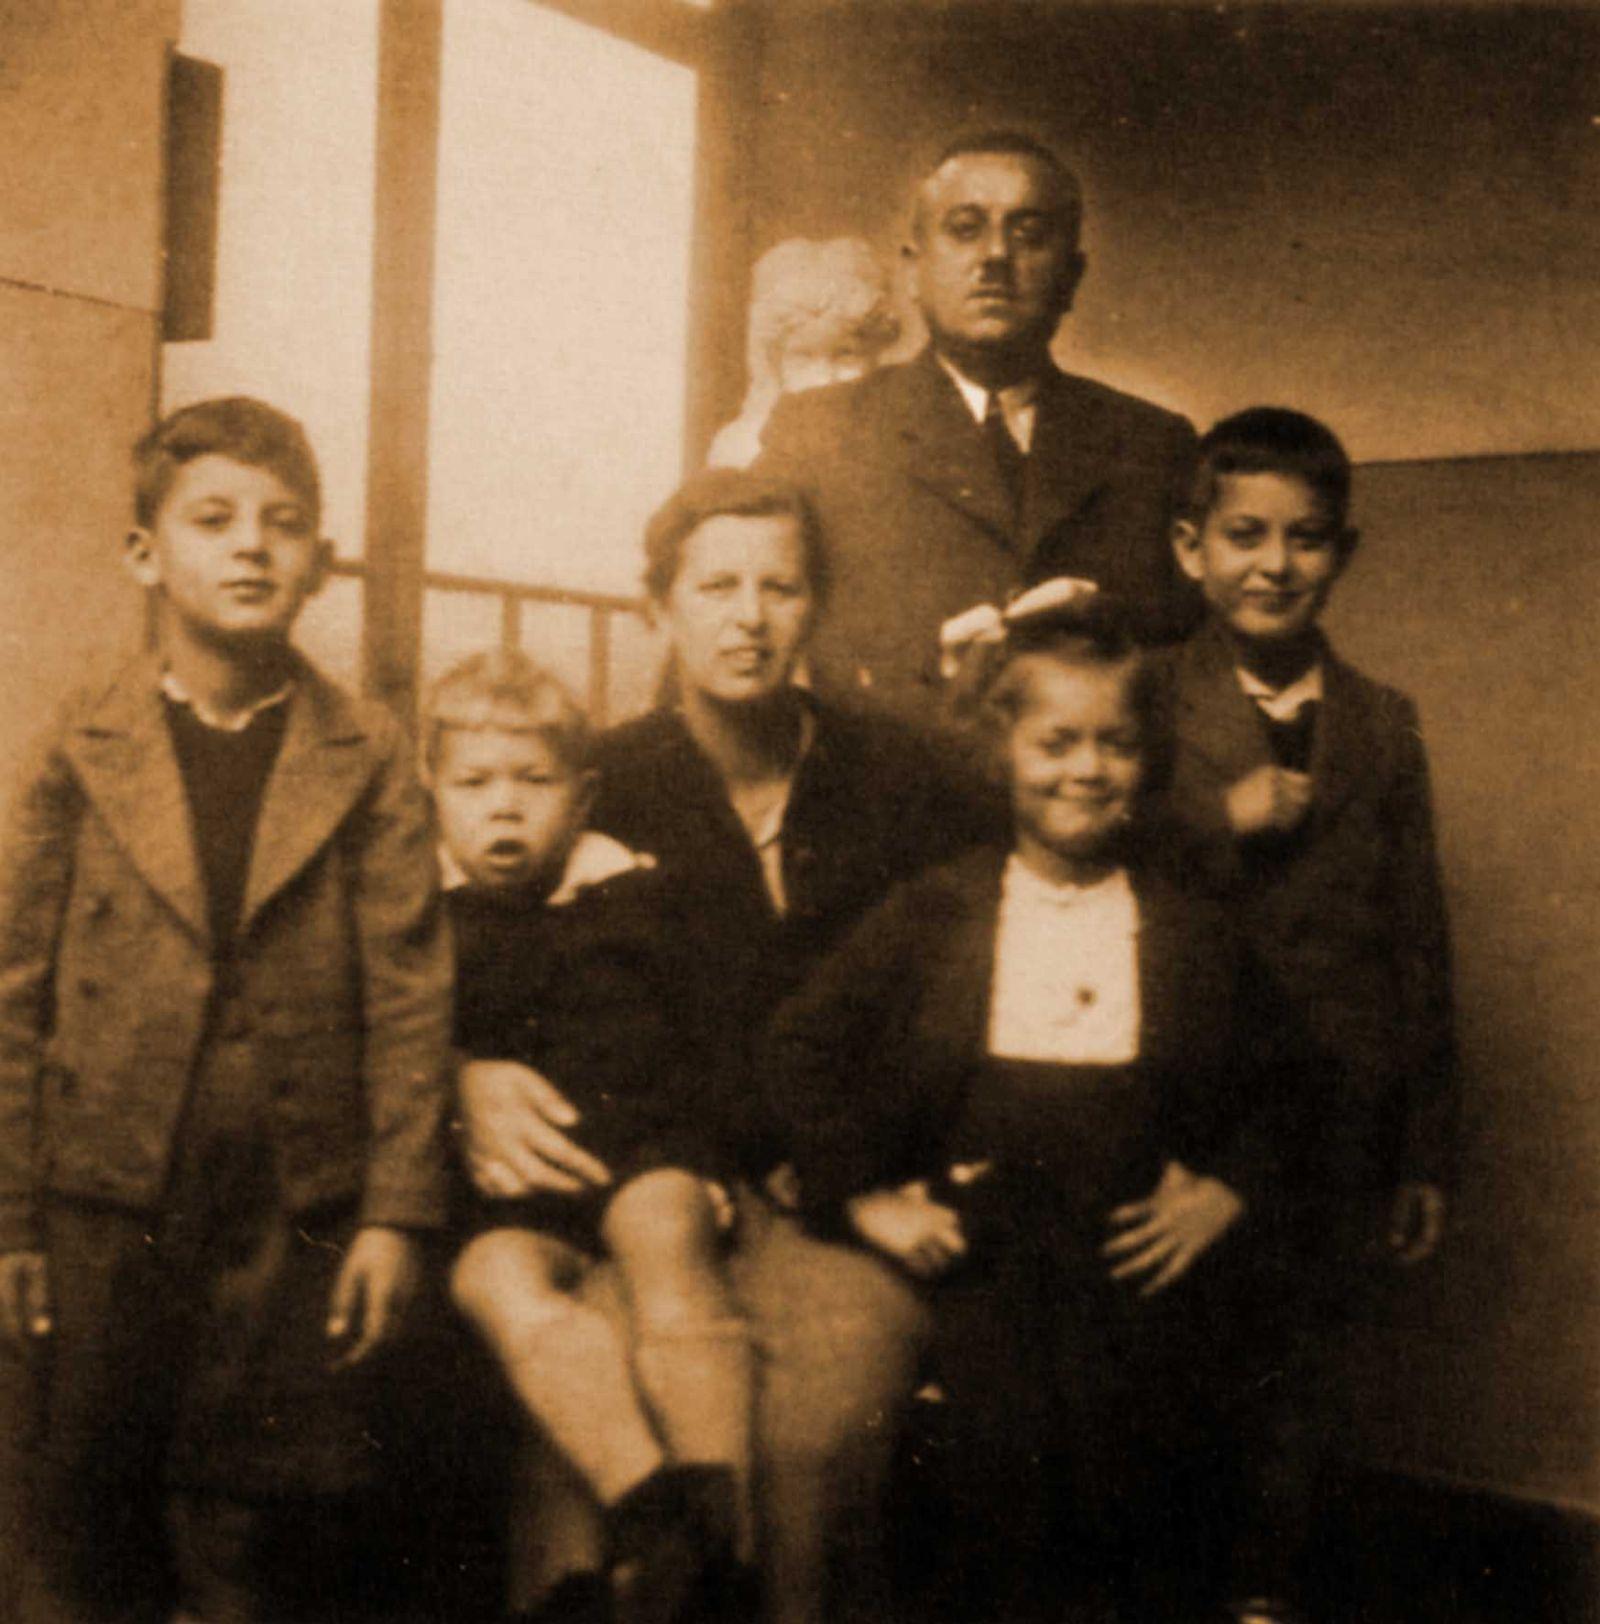 Familie Fröhlich